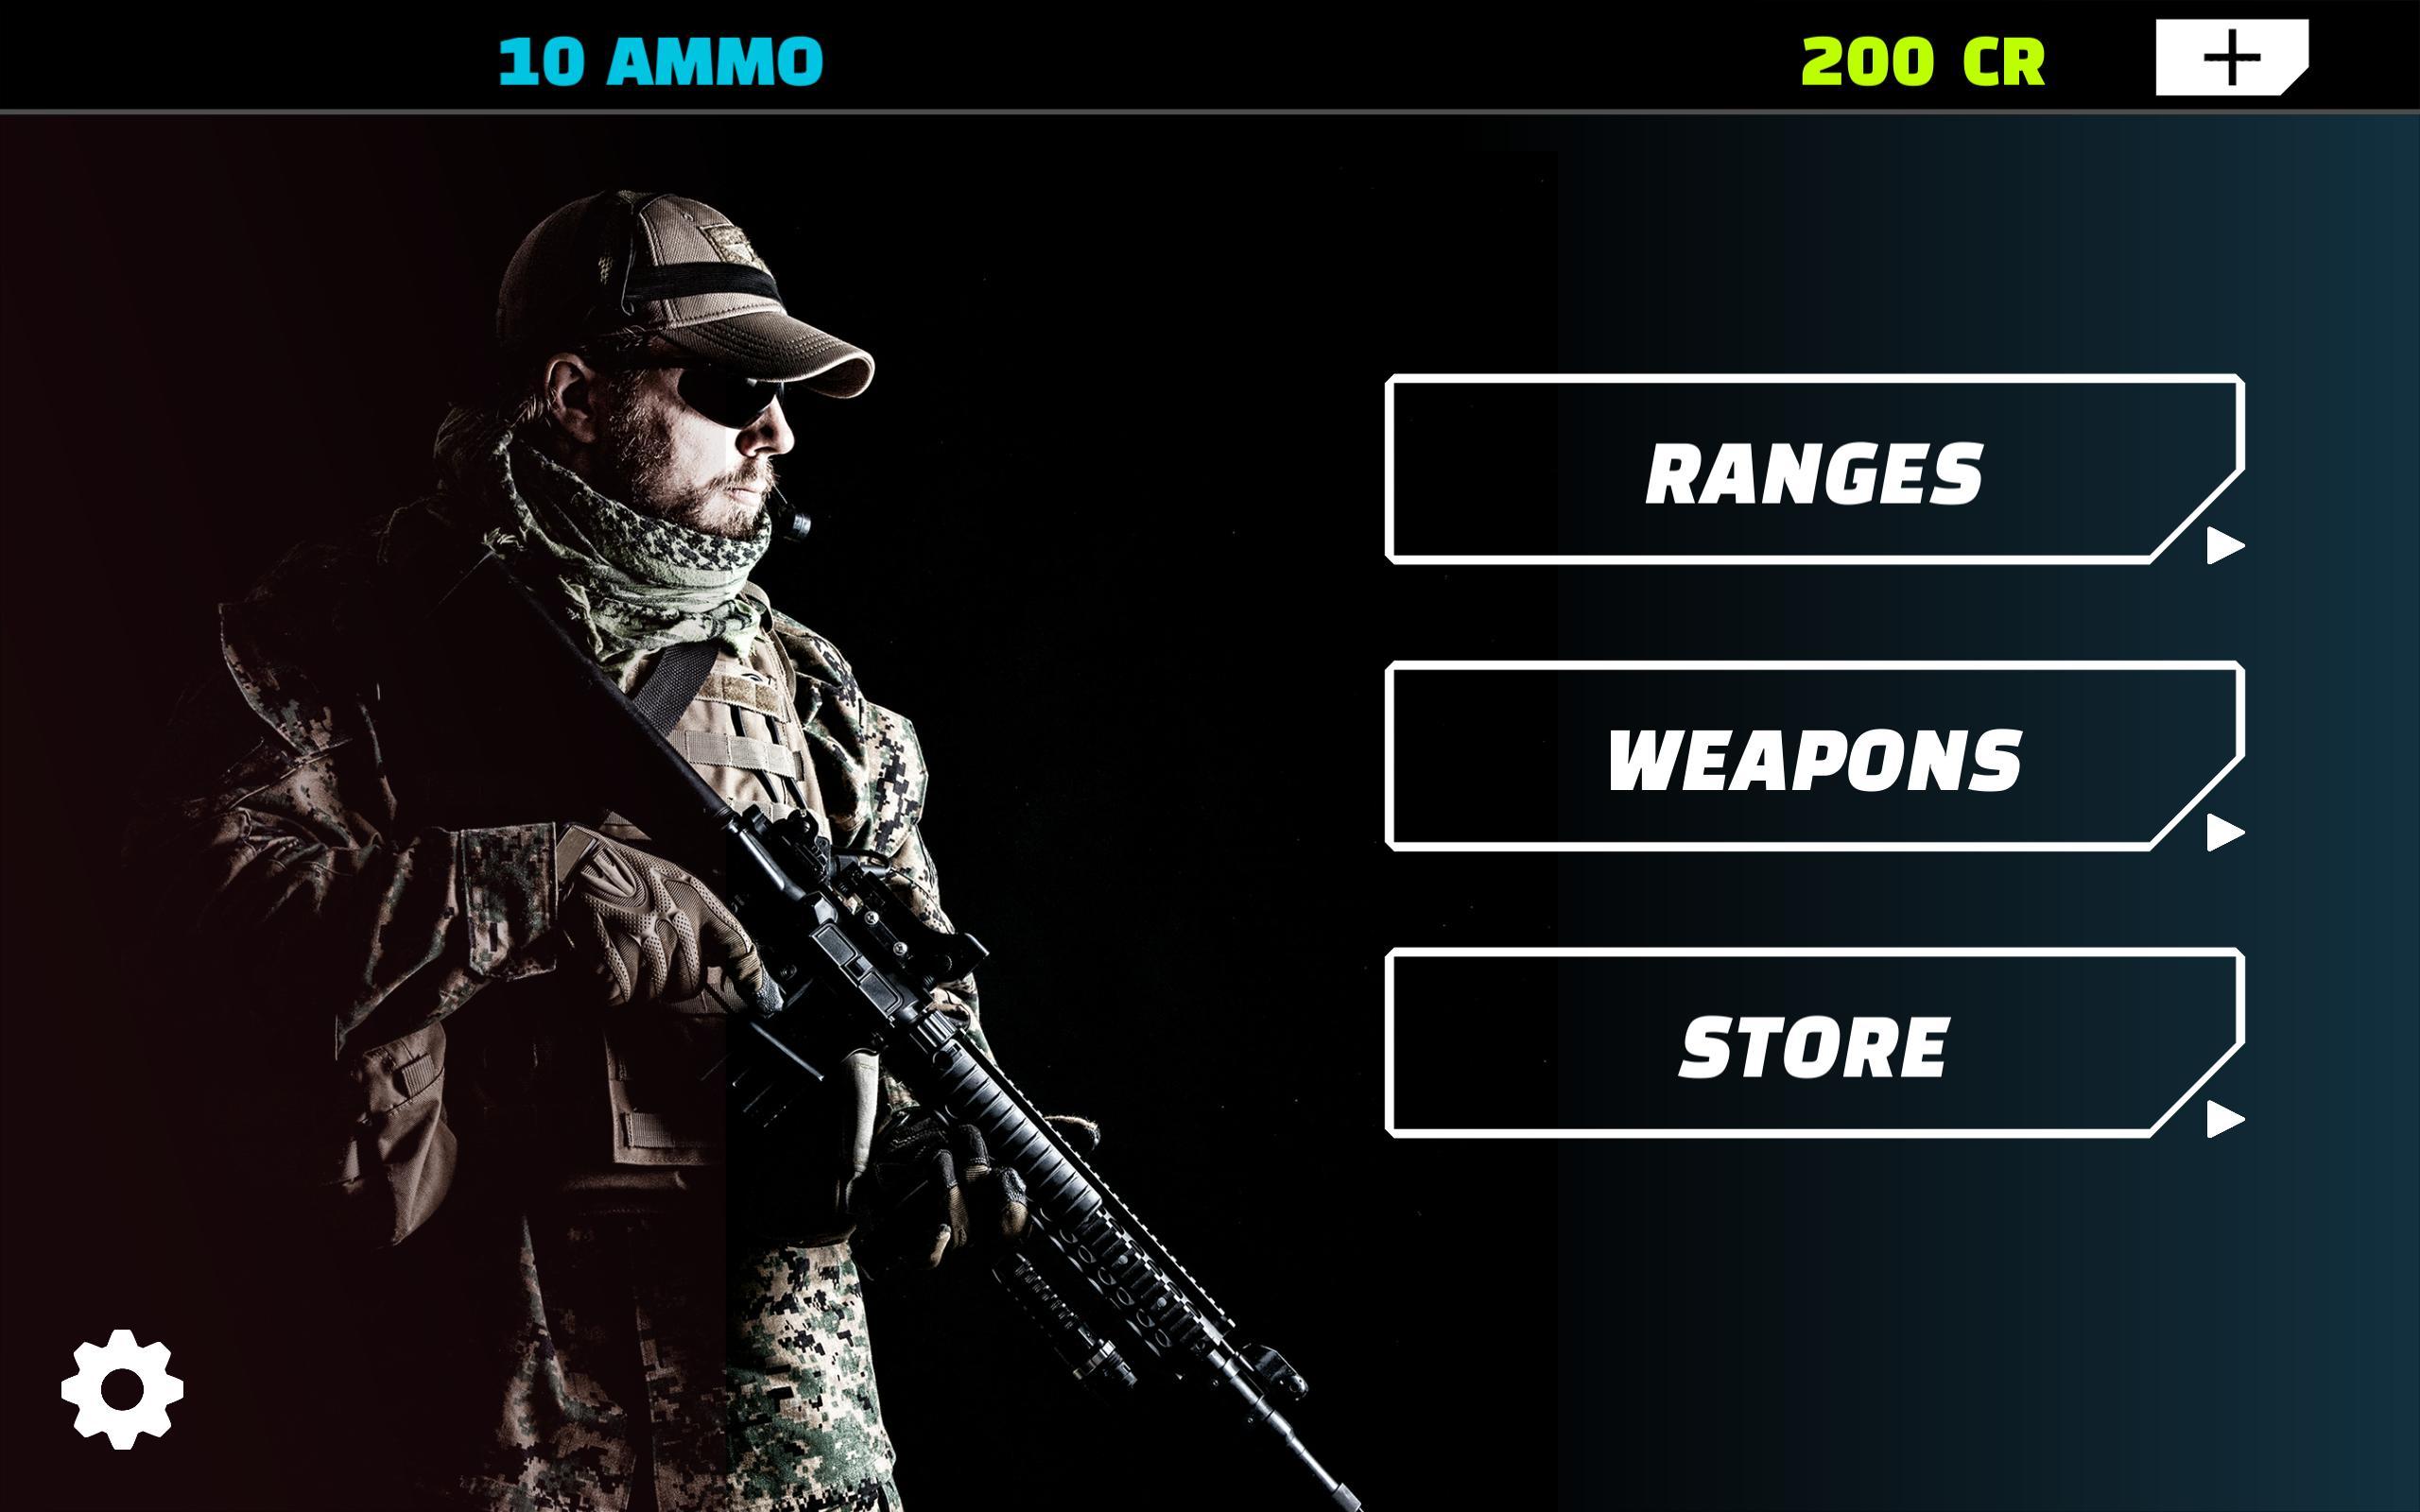 Canyon Shooting 2 - Free Shooting Range 3.0.6 Screenshot 12